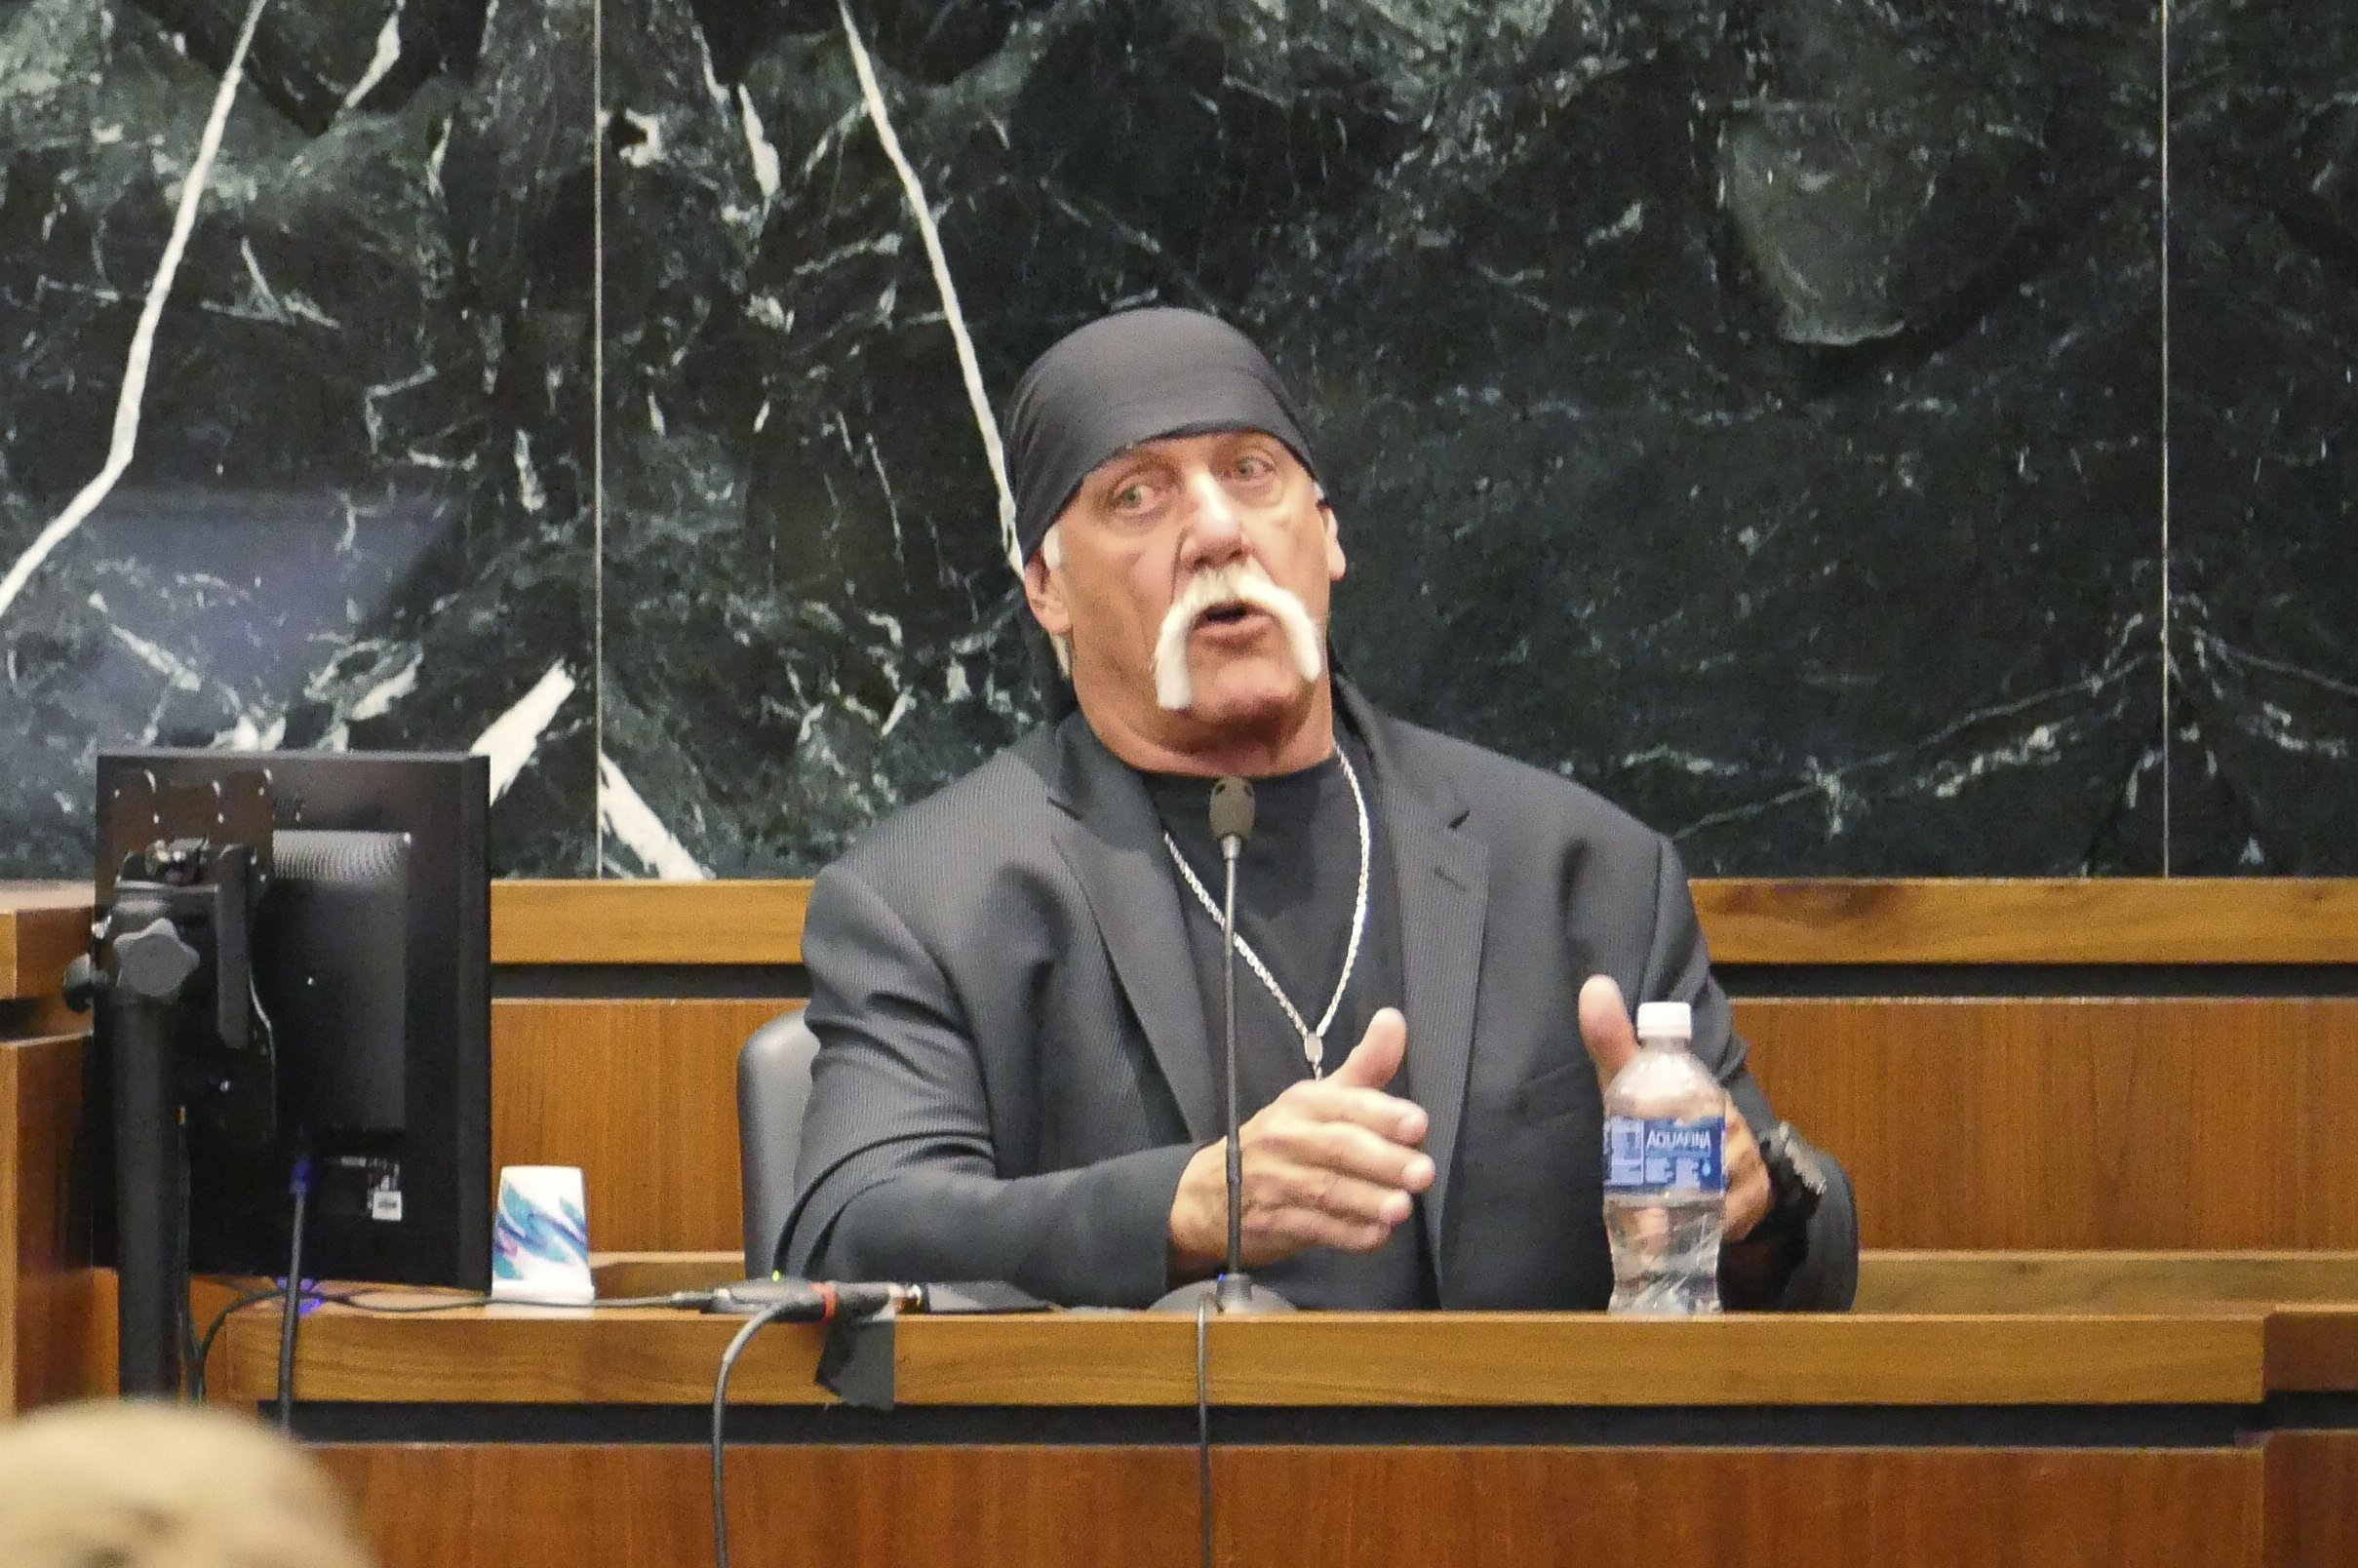 Hulk Hogan awarded £80million over sex tape leak on Gawker